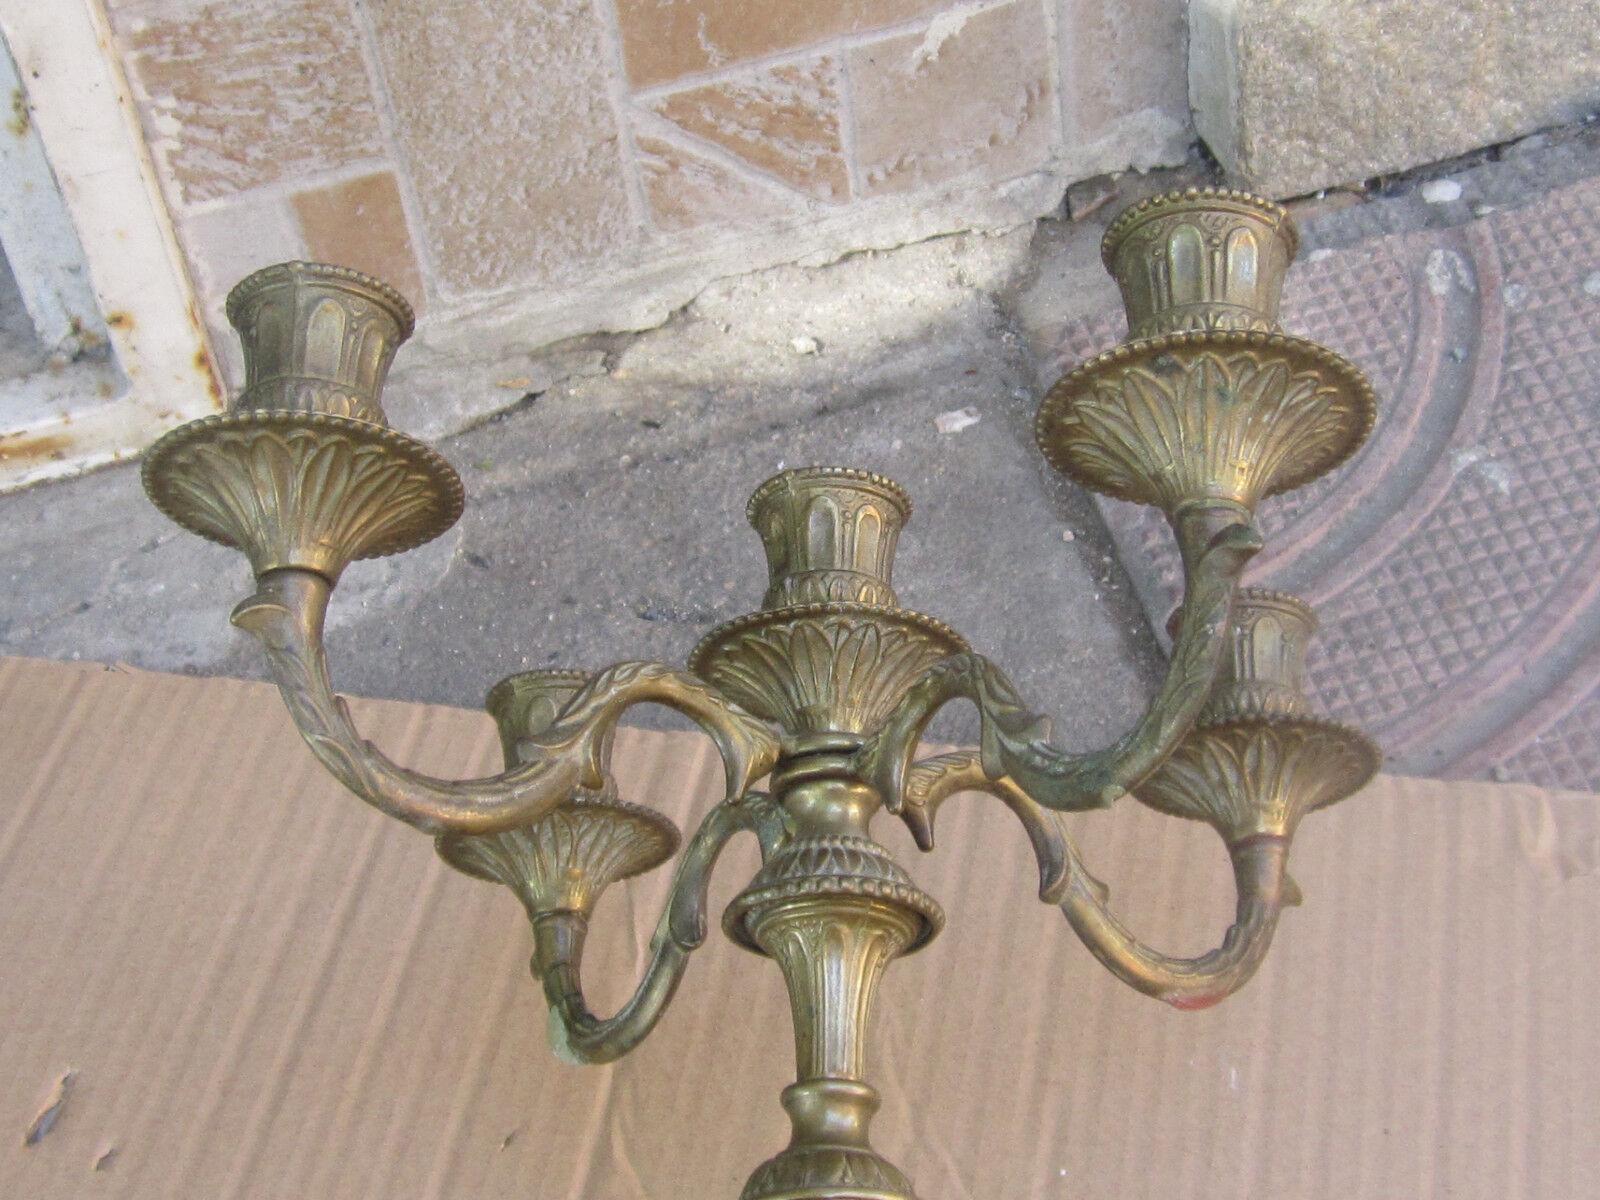 RARE ANTIQUE French Bronze Candelabra Candelabra Candelabra Candle Holder  19th C. a0a846